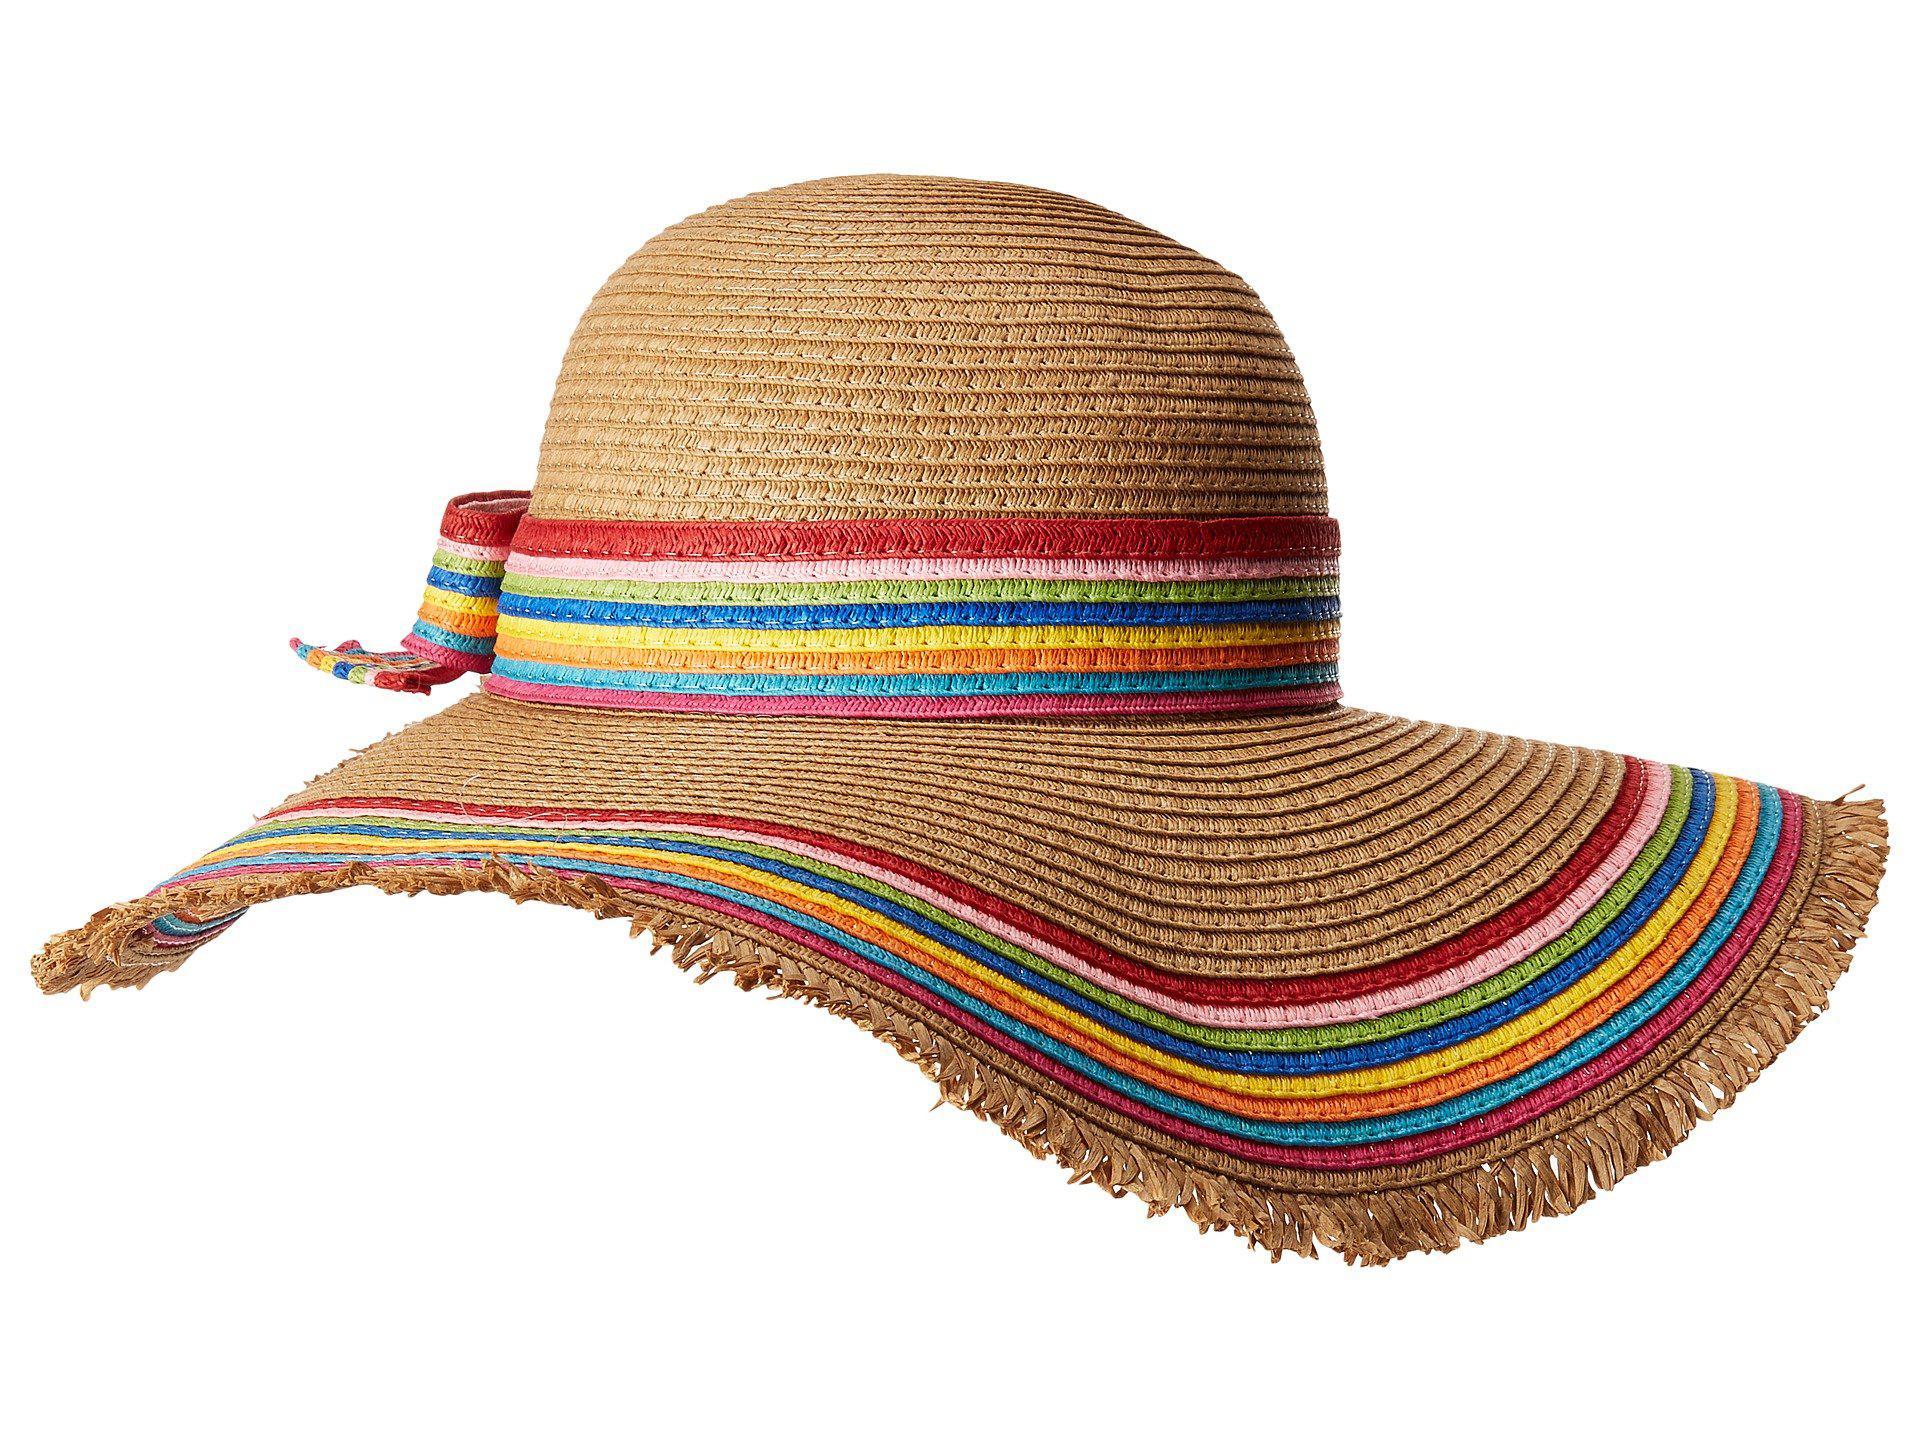 Lyst - Betsey Johnson Rainbow Raw Edge Floppy Hat (tan) Caps 6e0d31e05af3